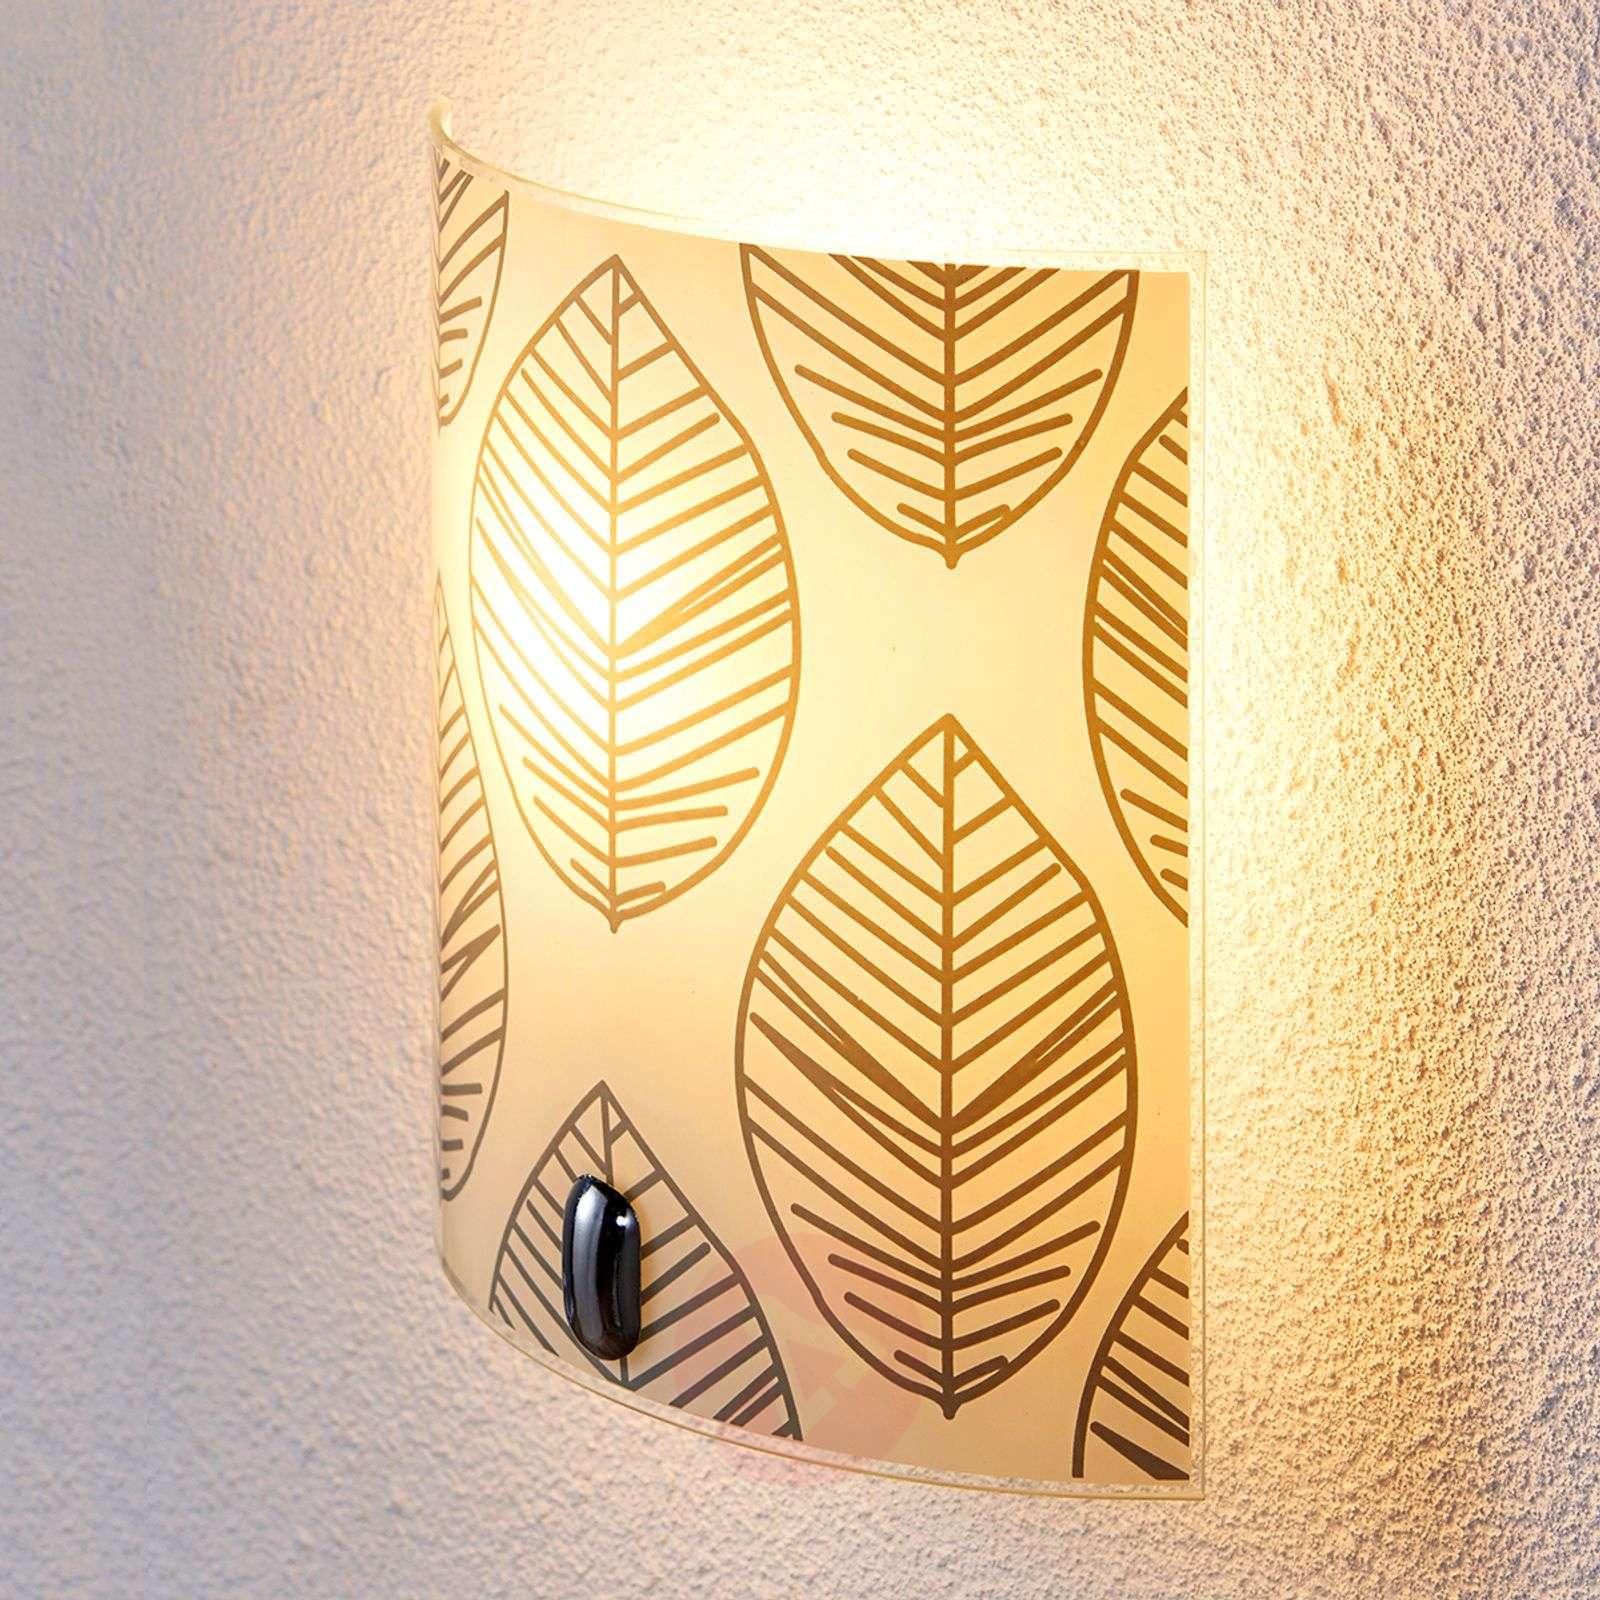 Savas - glass wall lamp with leaf décor | Lights.ie